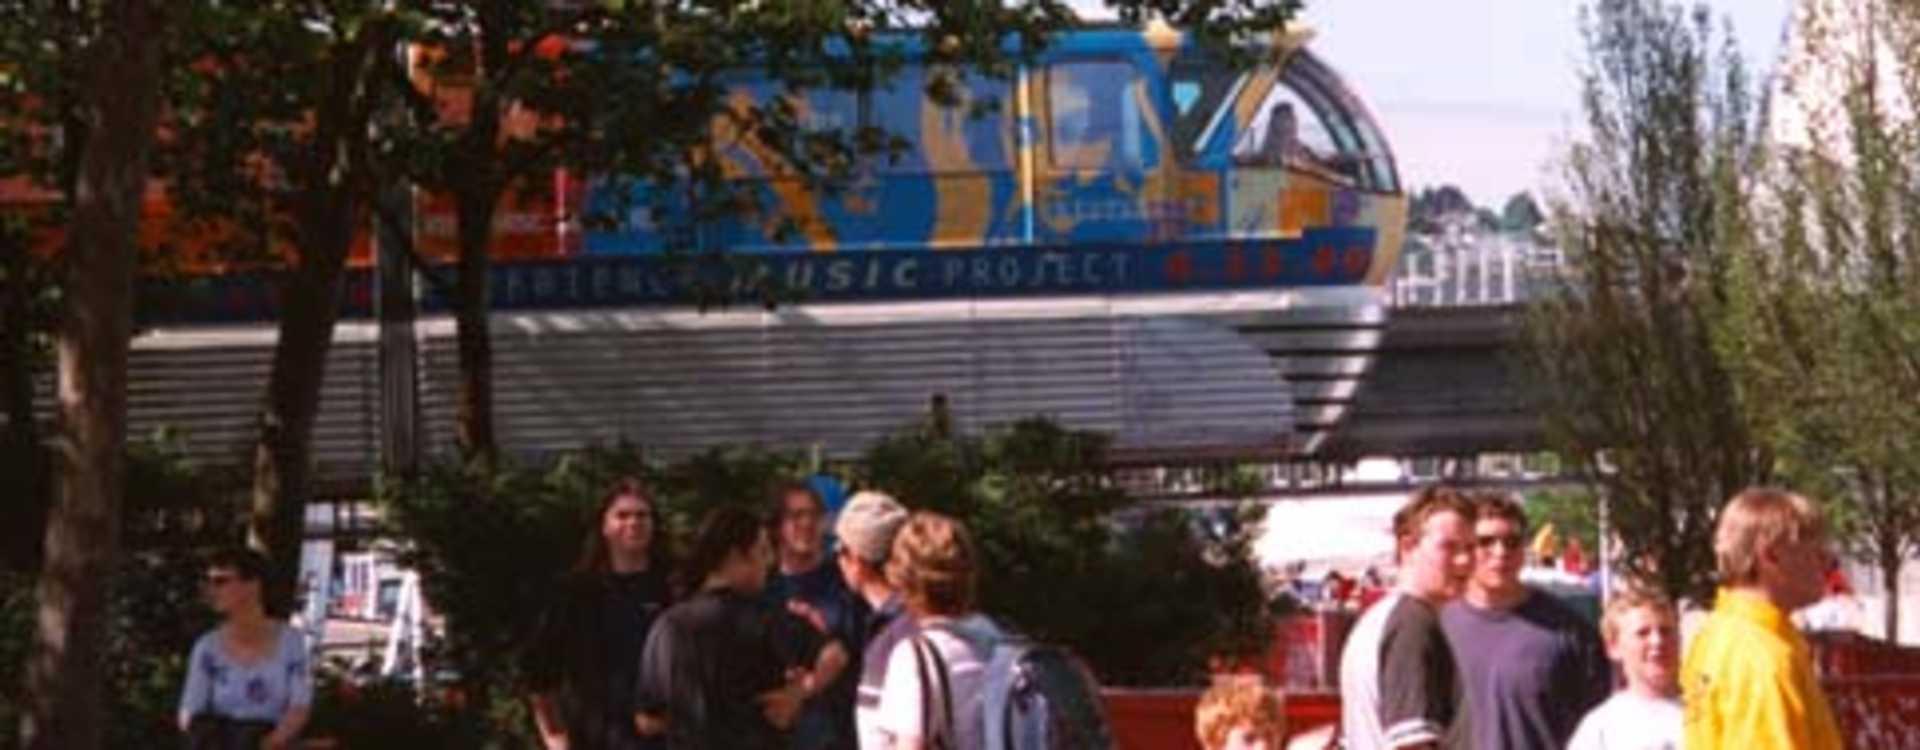 Seattle_Monorail-4.jpg